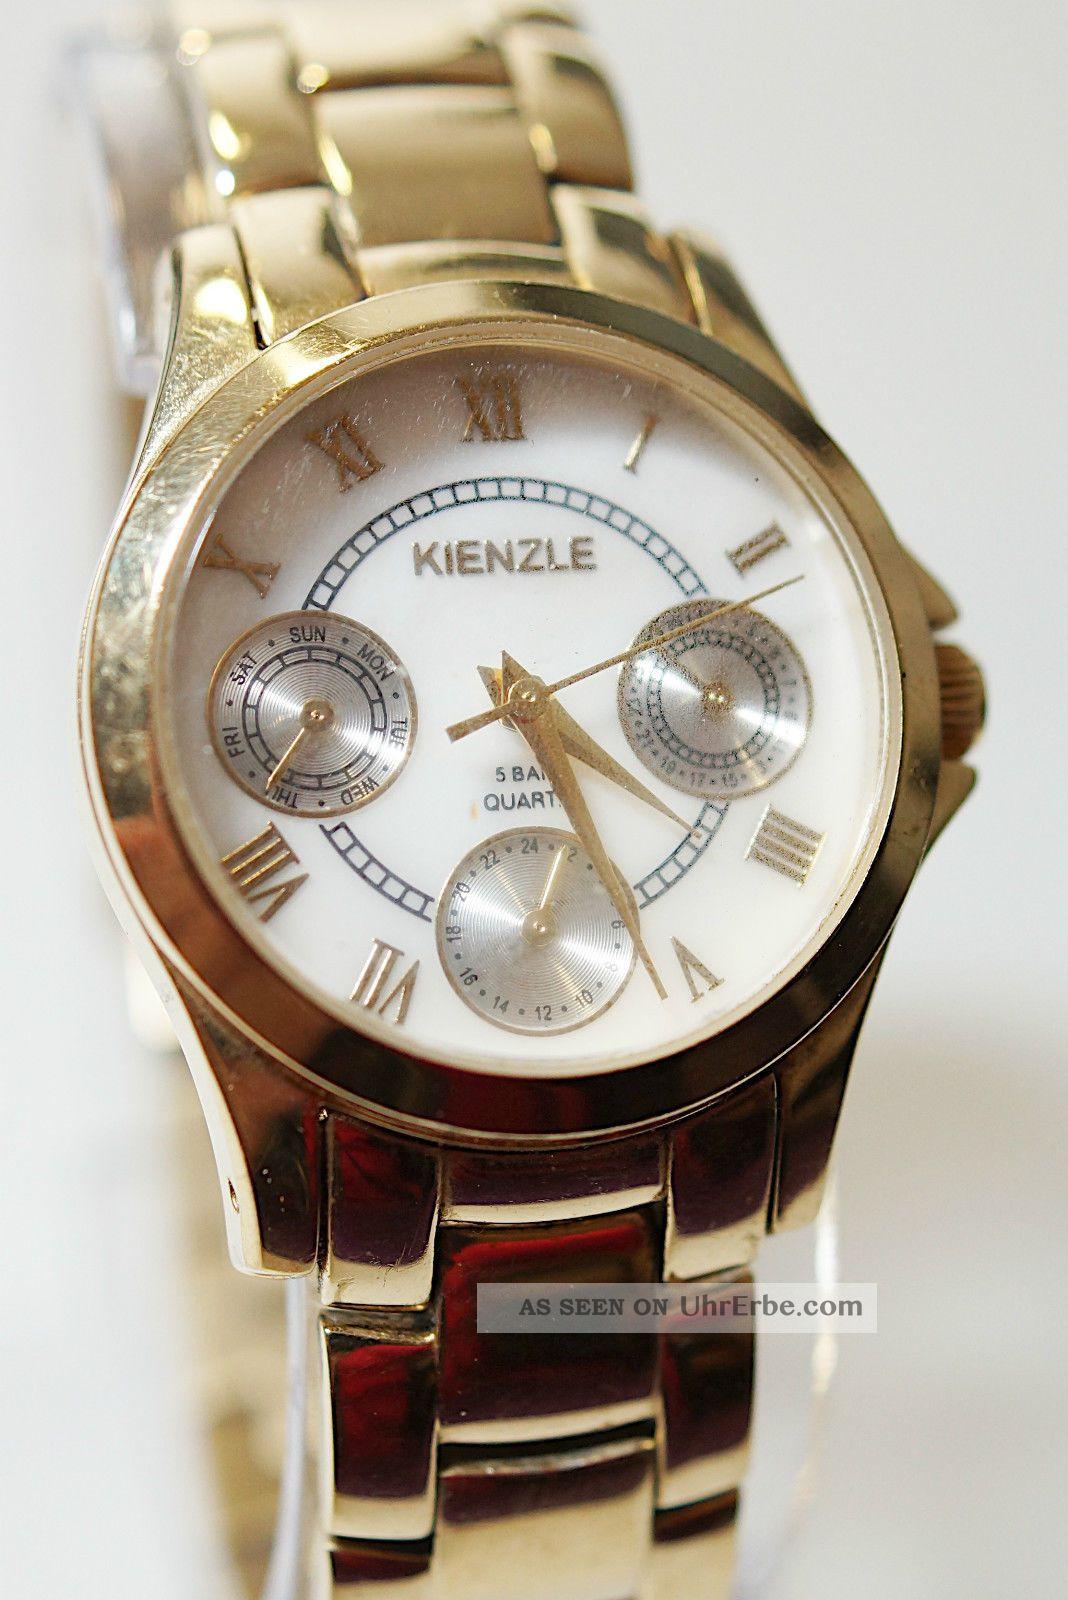 Kienzle 5 Bar Quarz Messing Damenuhr Armband Römische Zahl Funktion Ok Armbanduhren Bild